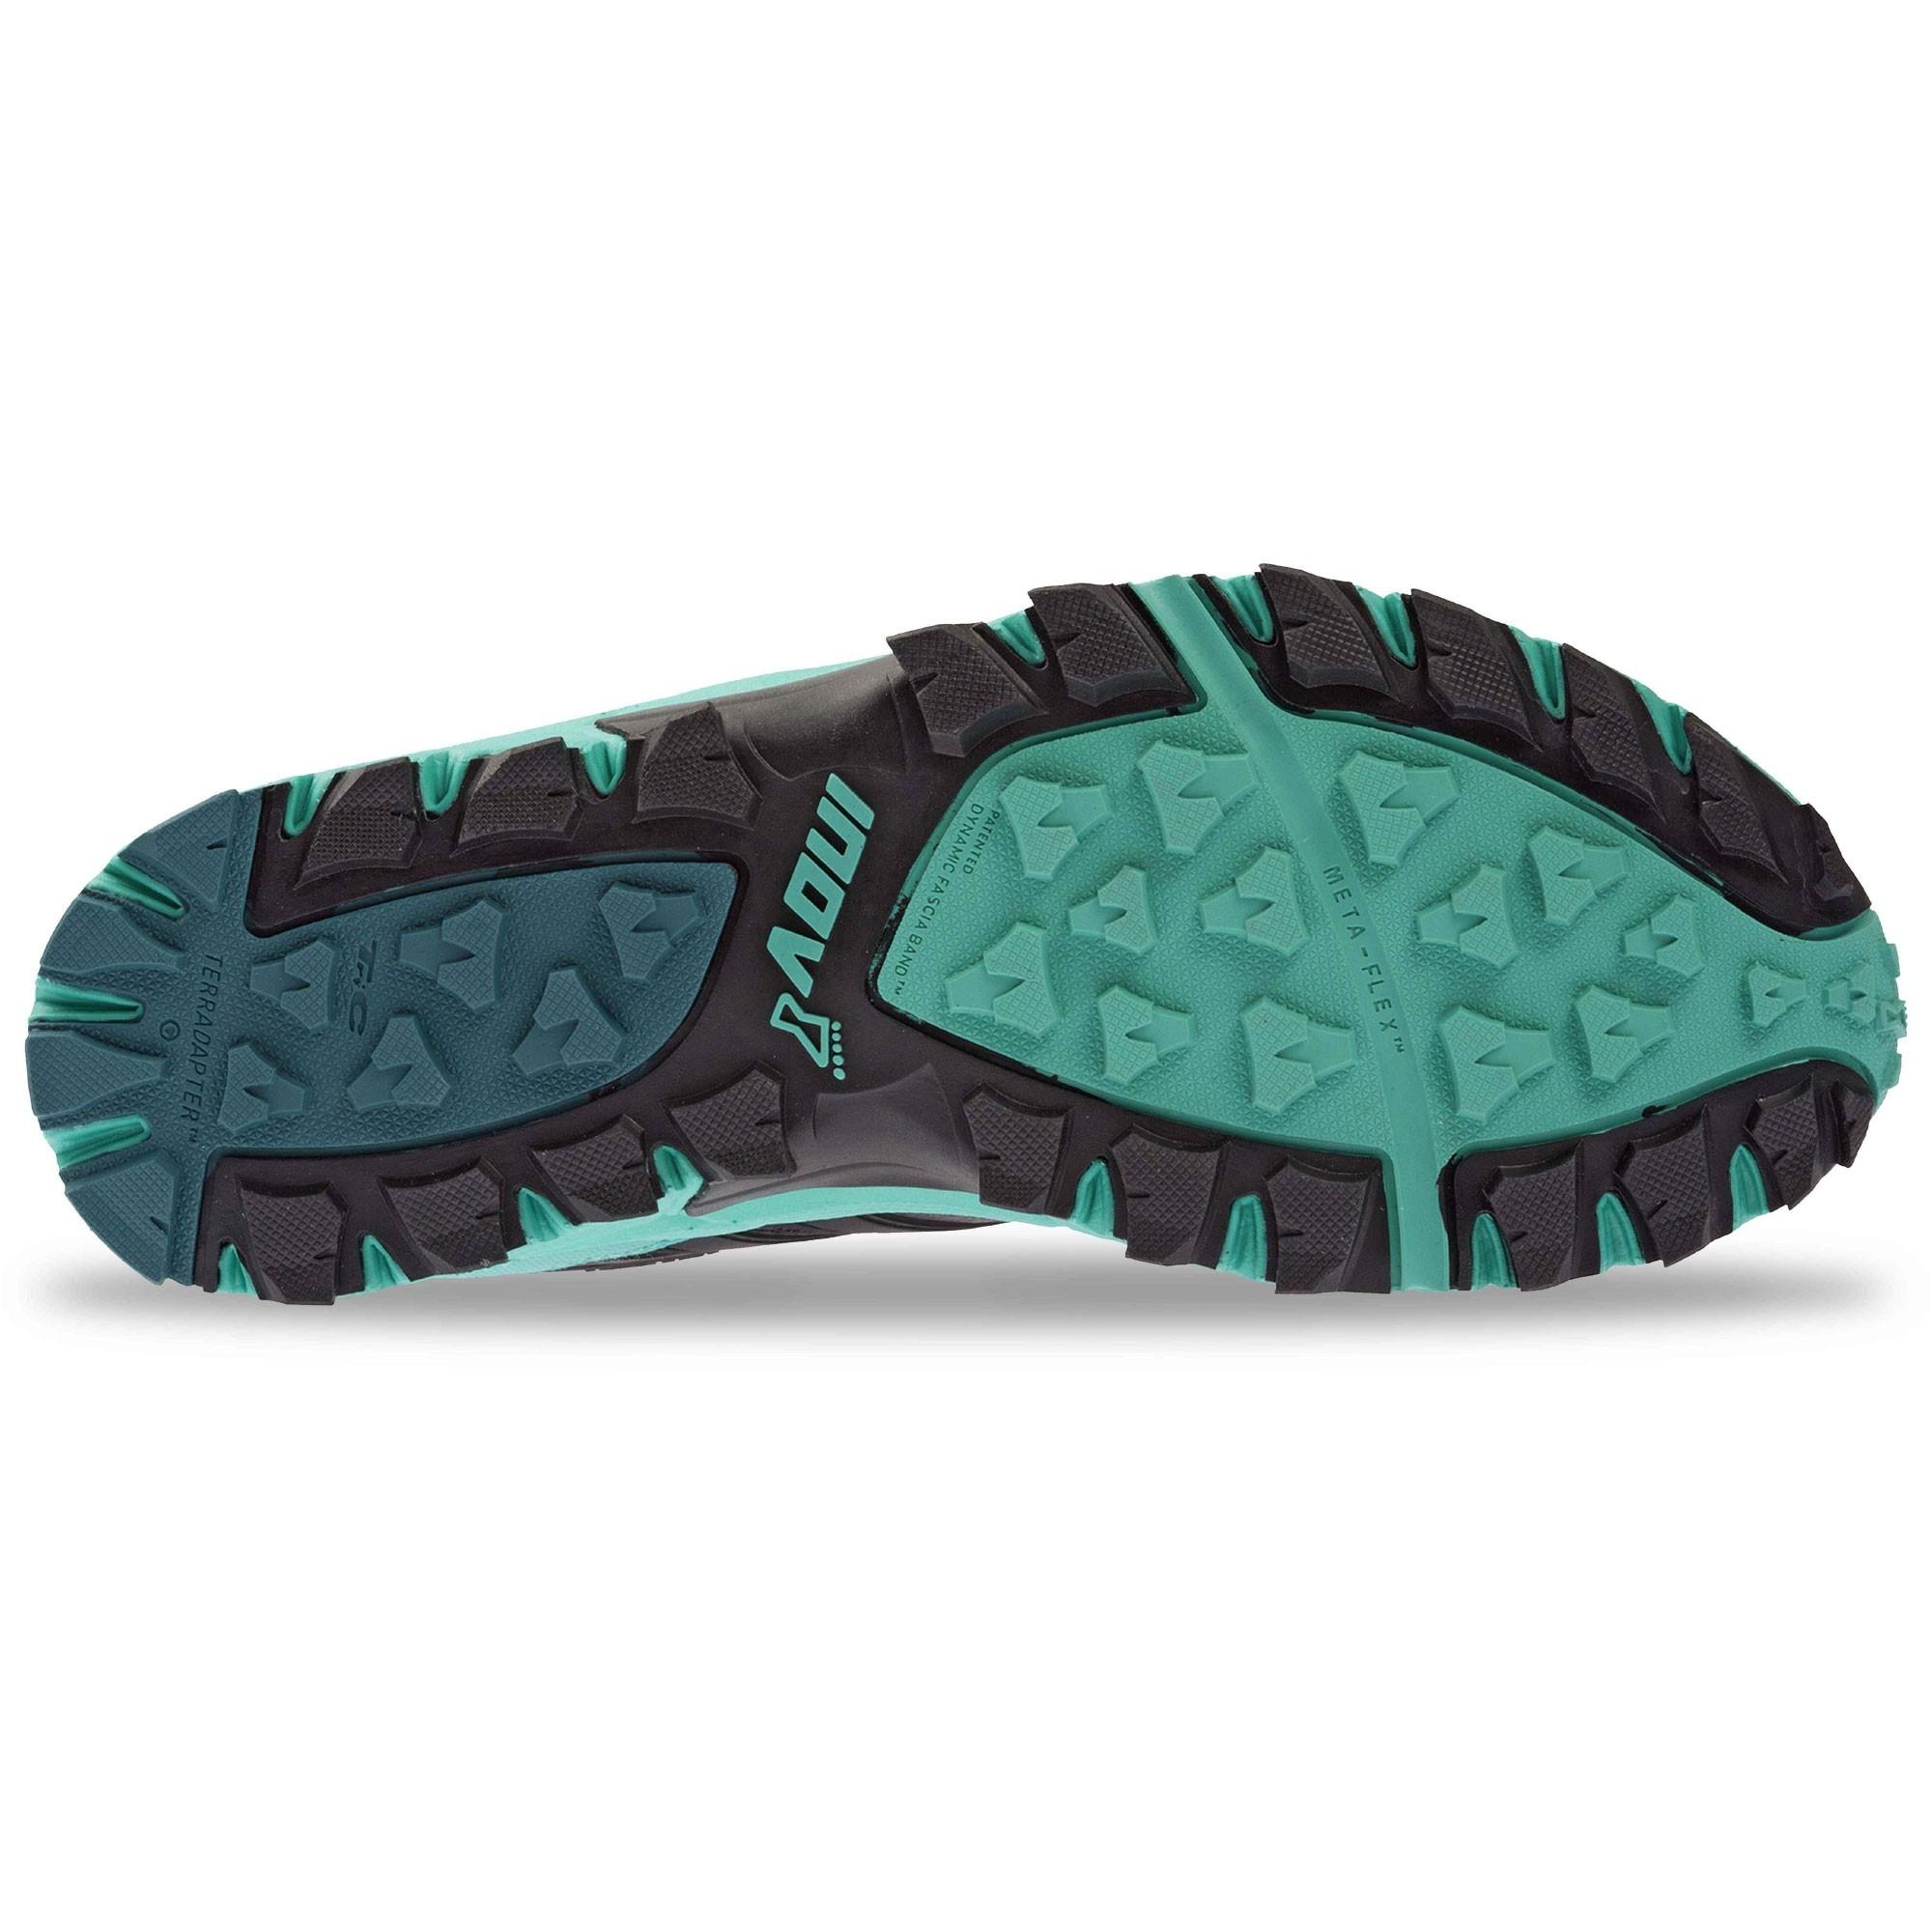 Inov8 Trail Talon 290 Trail Running Shoes - Black/Teal - Sole